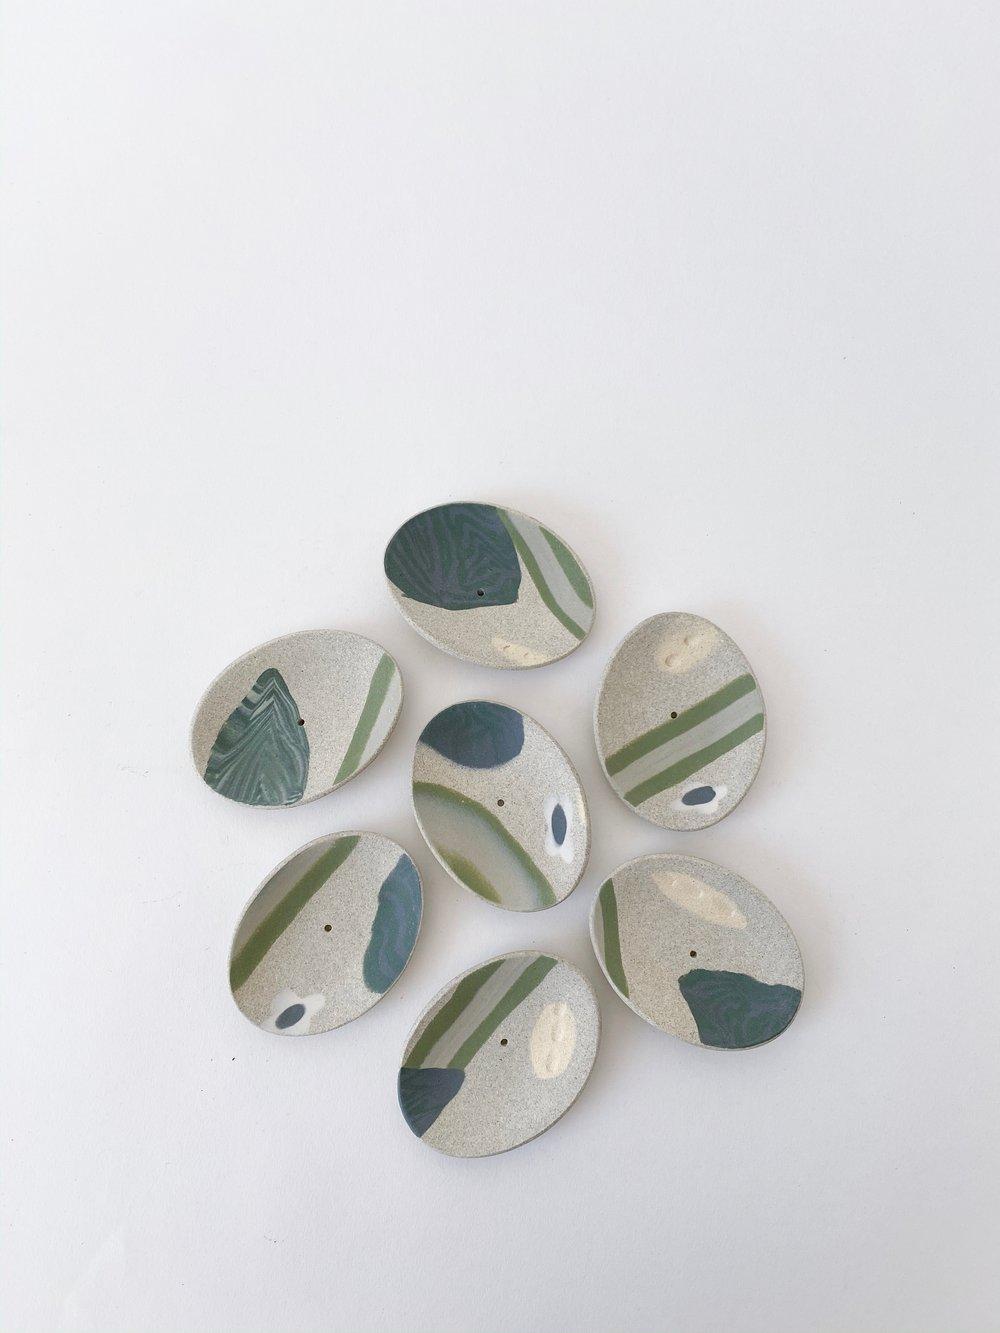 Image of Granite Garden - Incense Holder